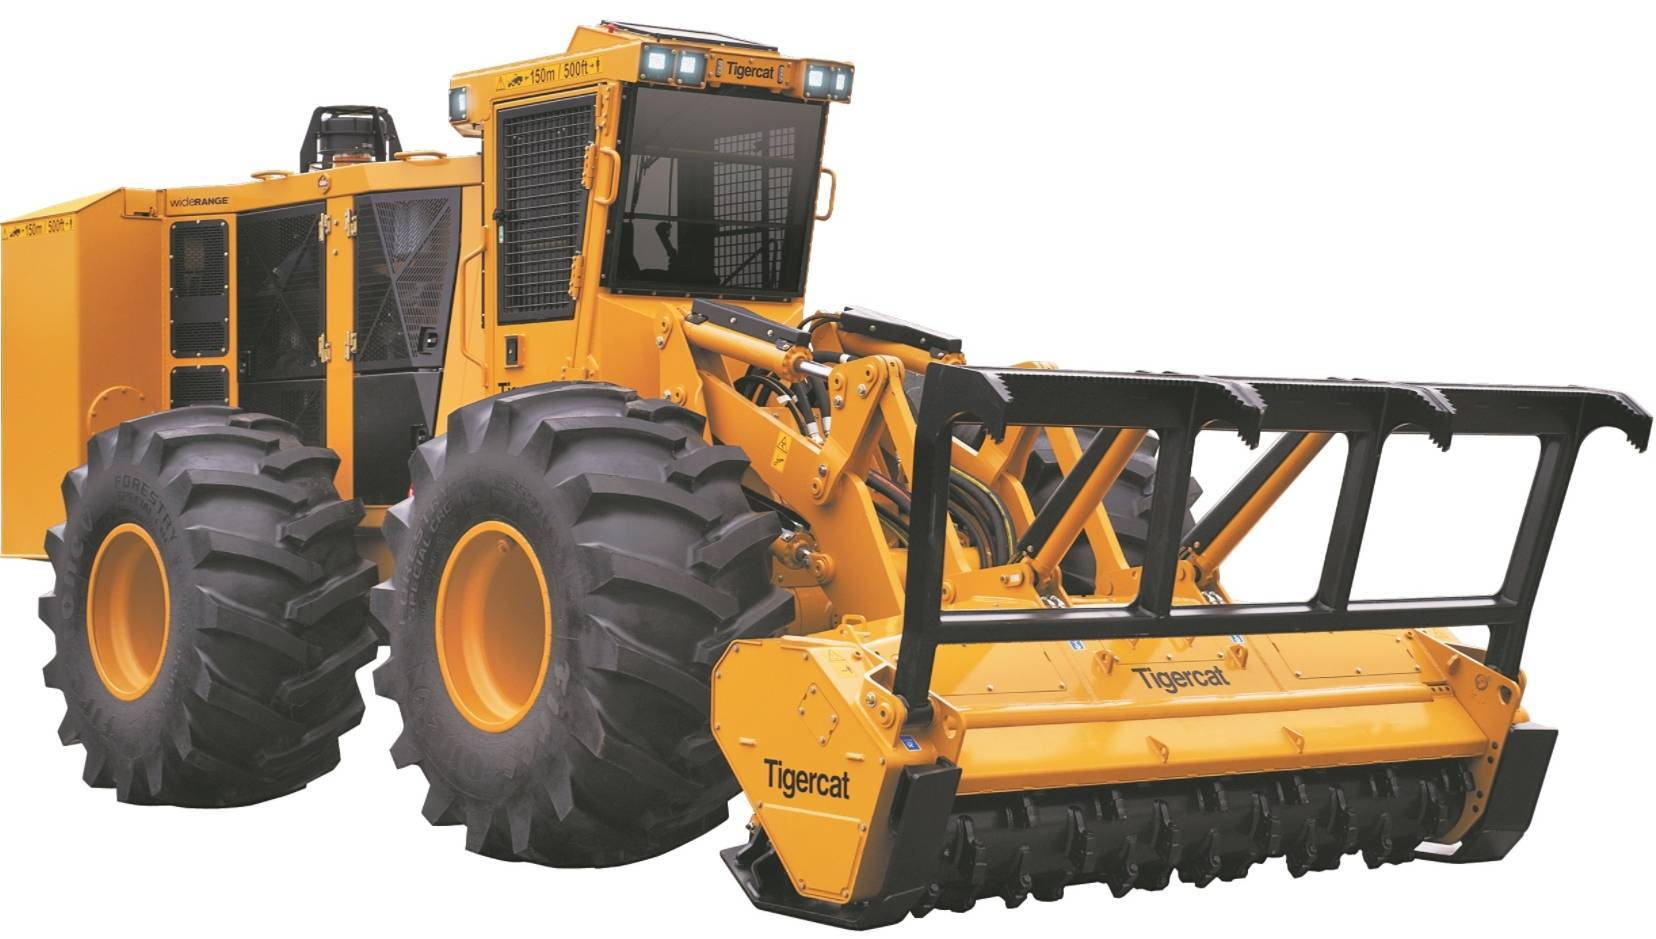 O Tigercat acrescenta um dispositivo de mulching de alta eficiência